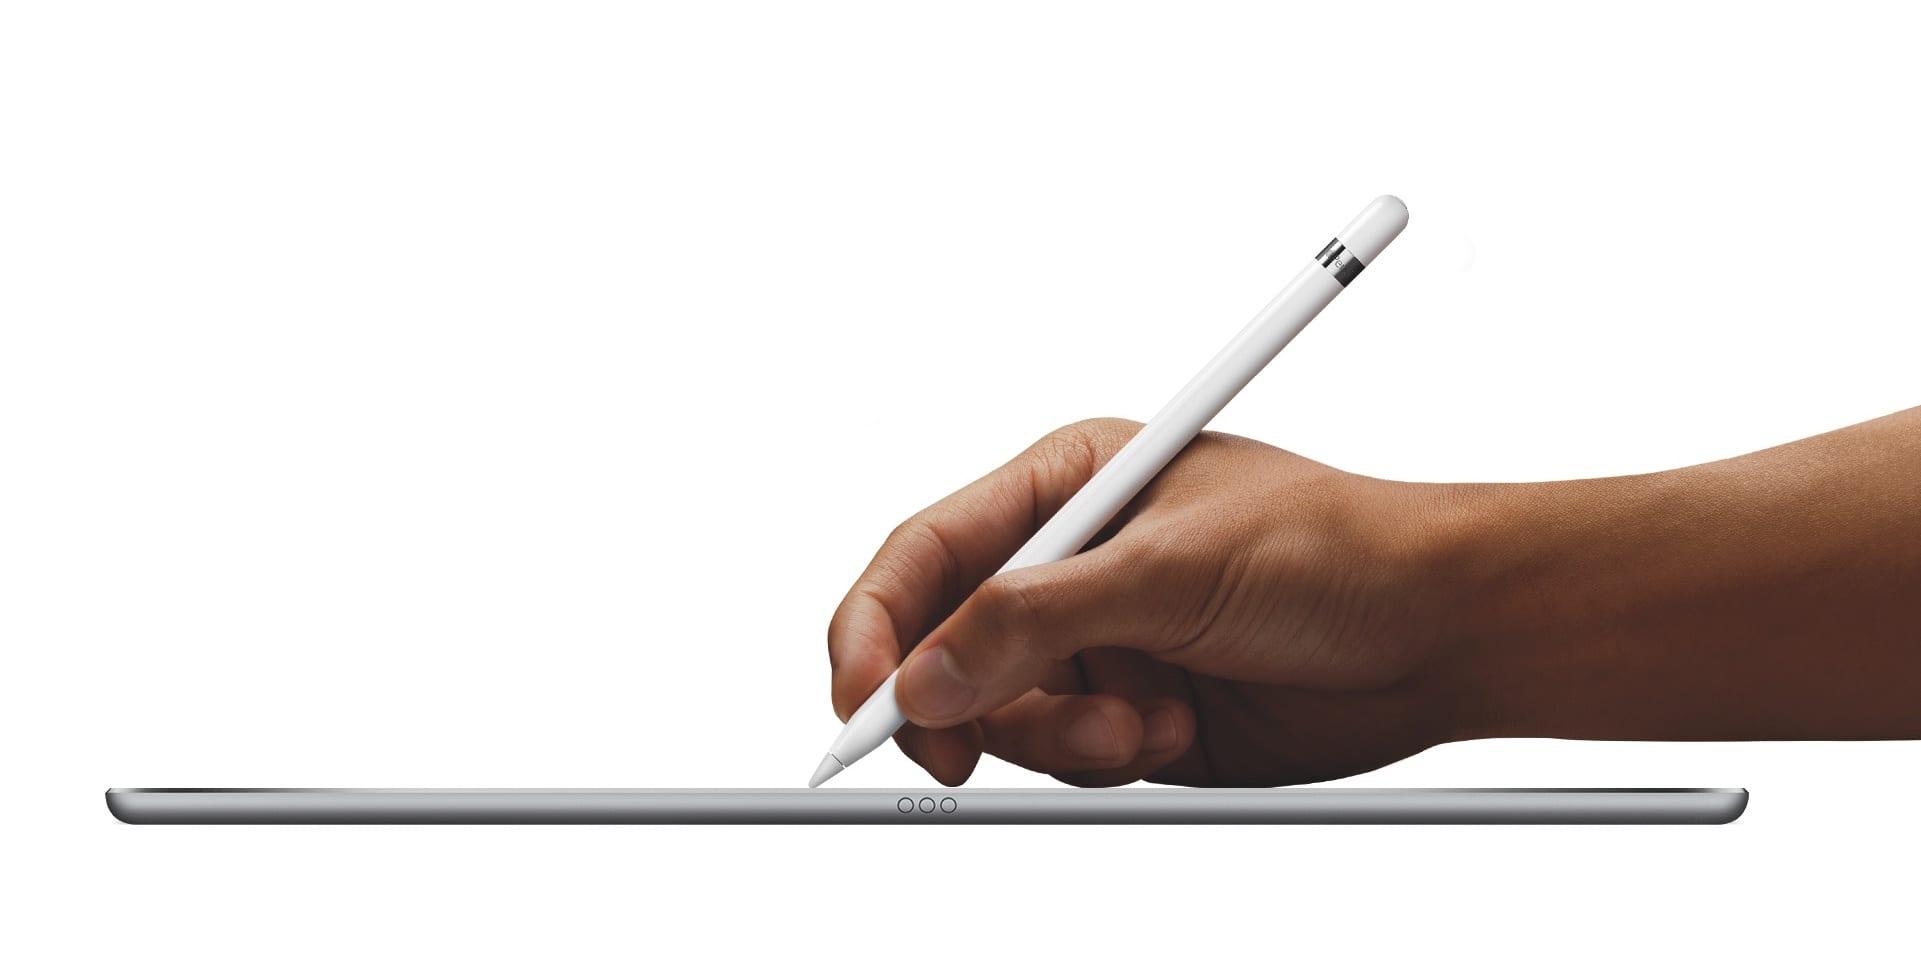 iPadPro Pencil Hand PRINT - Októbrový event: nové iPady, Pencil, MacBook Air, Mac Mini a viac…